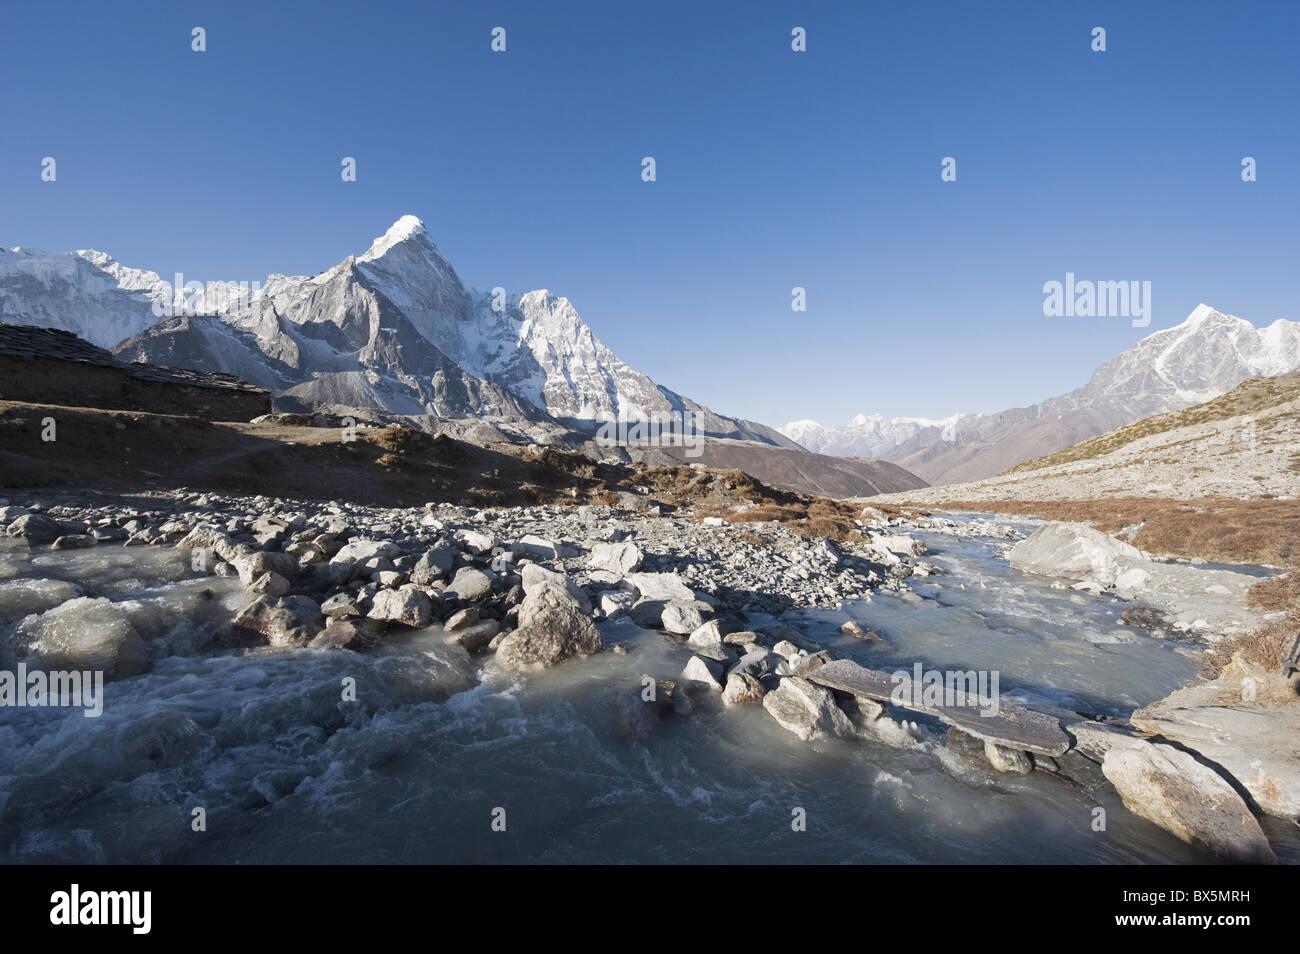 Mountain stream and Ama Dablam, 6812m, Solu Khumbu Everest Region, Sagarmatha National Park, Himalayas, Nepal, Asia - Stock Image